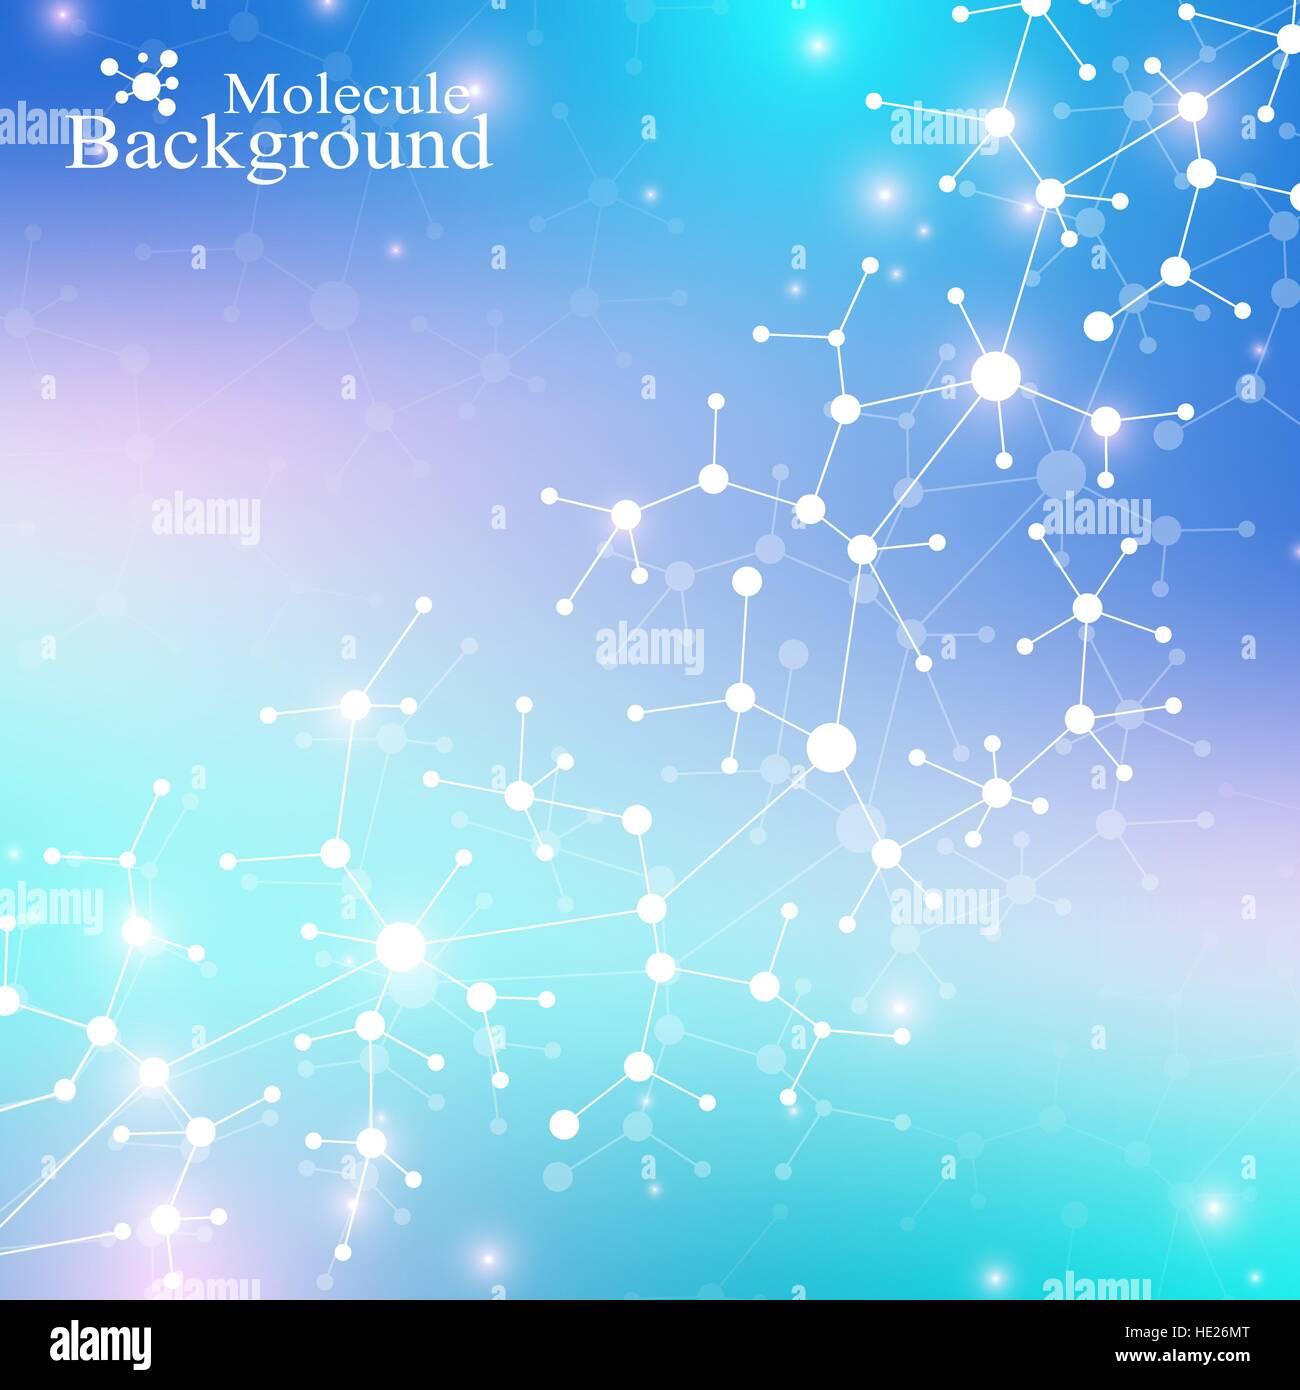 Dna Model Wallpaper: Modern Structure Molecule DNA. Atom. Molecule And